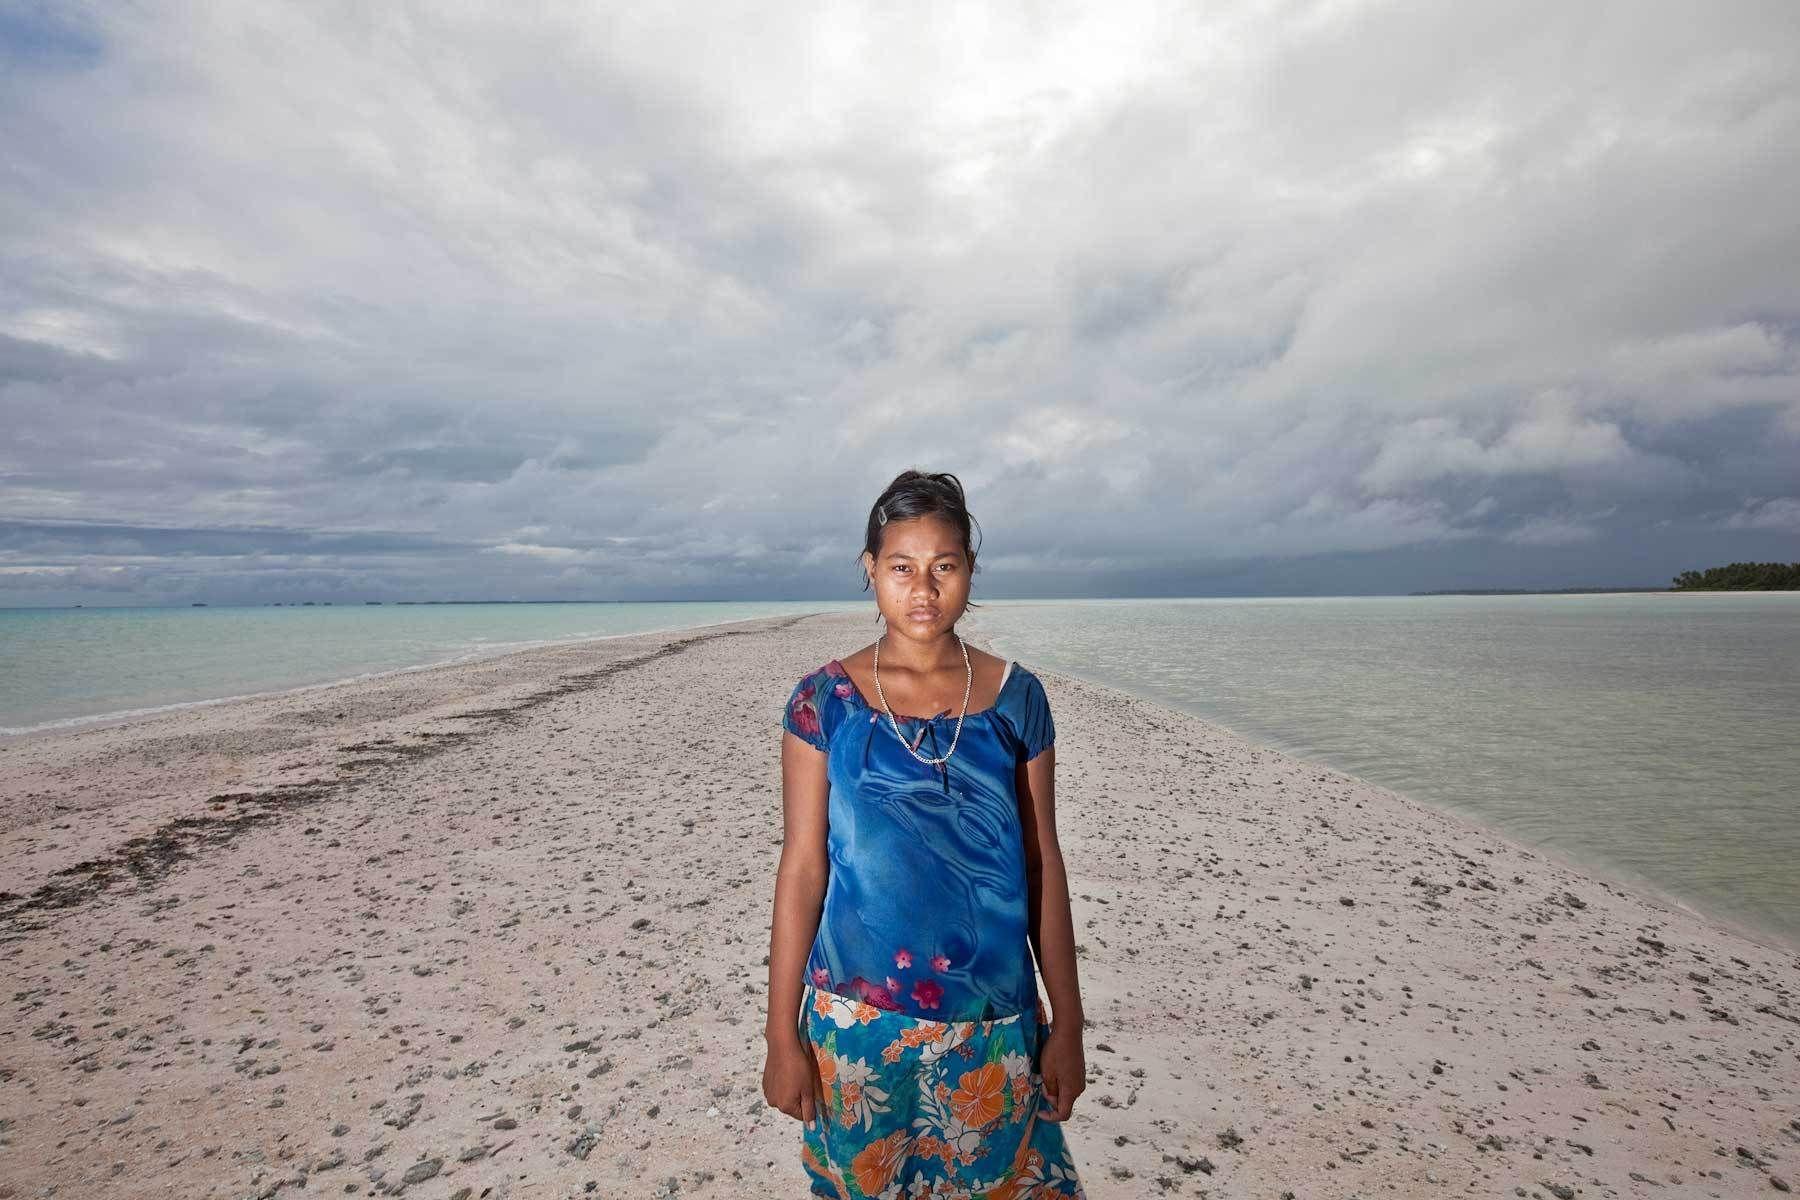 Oxfam Australia